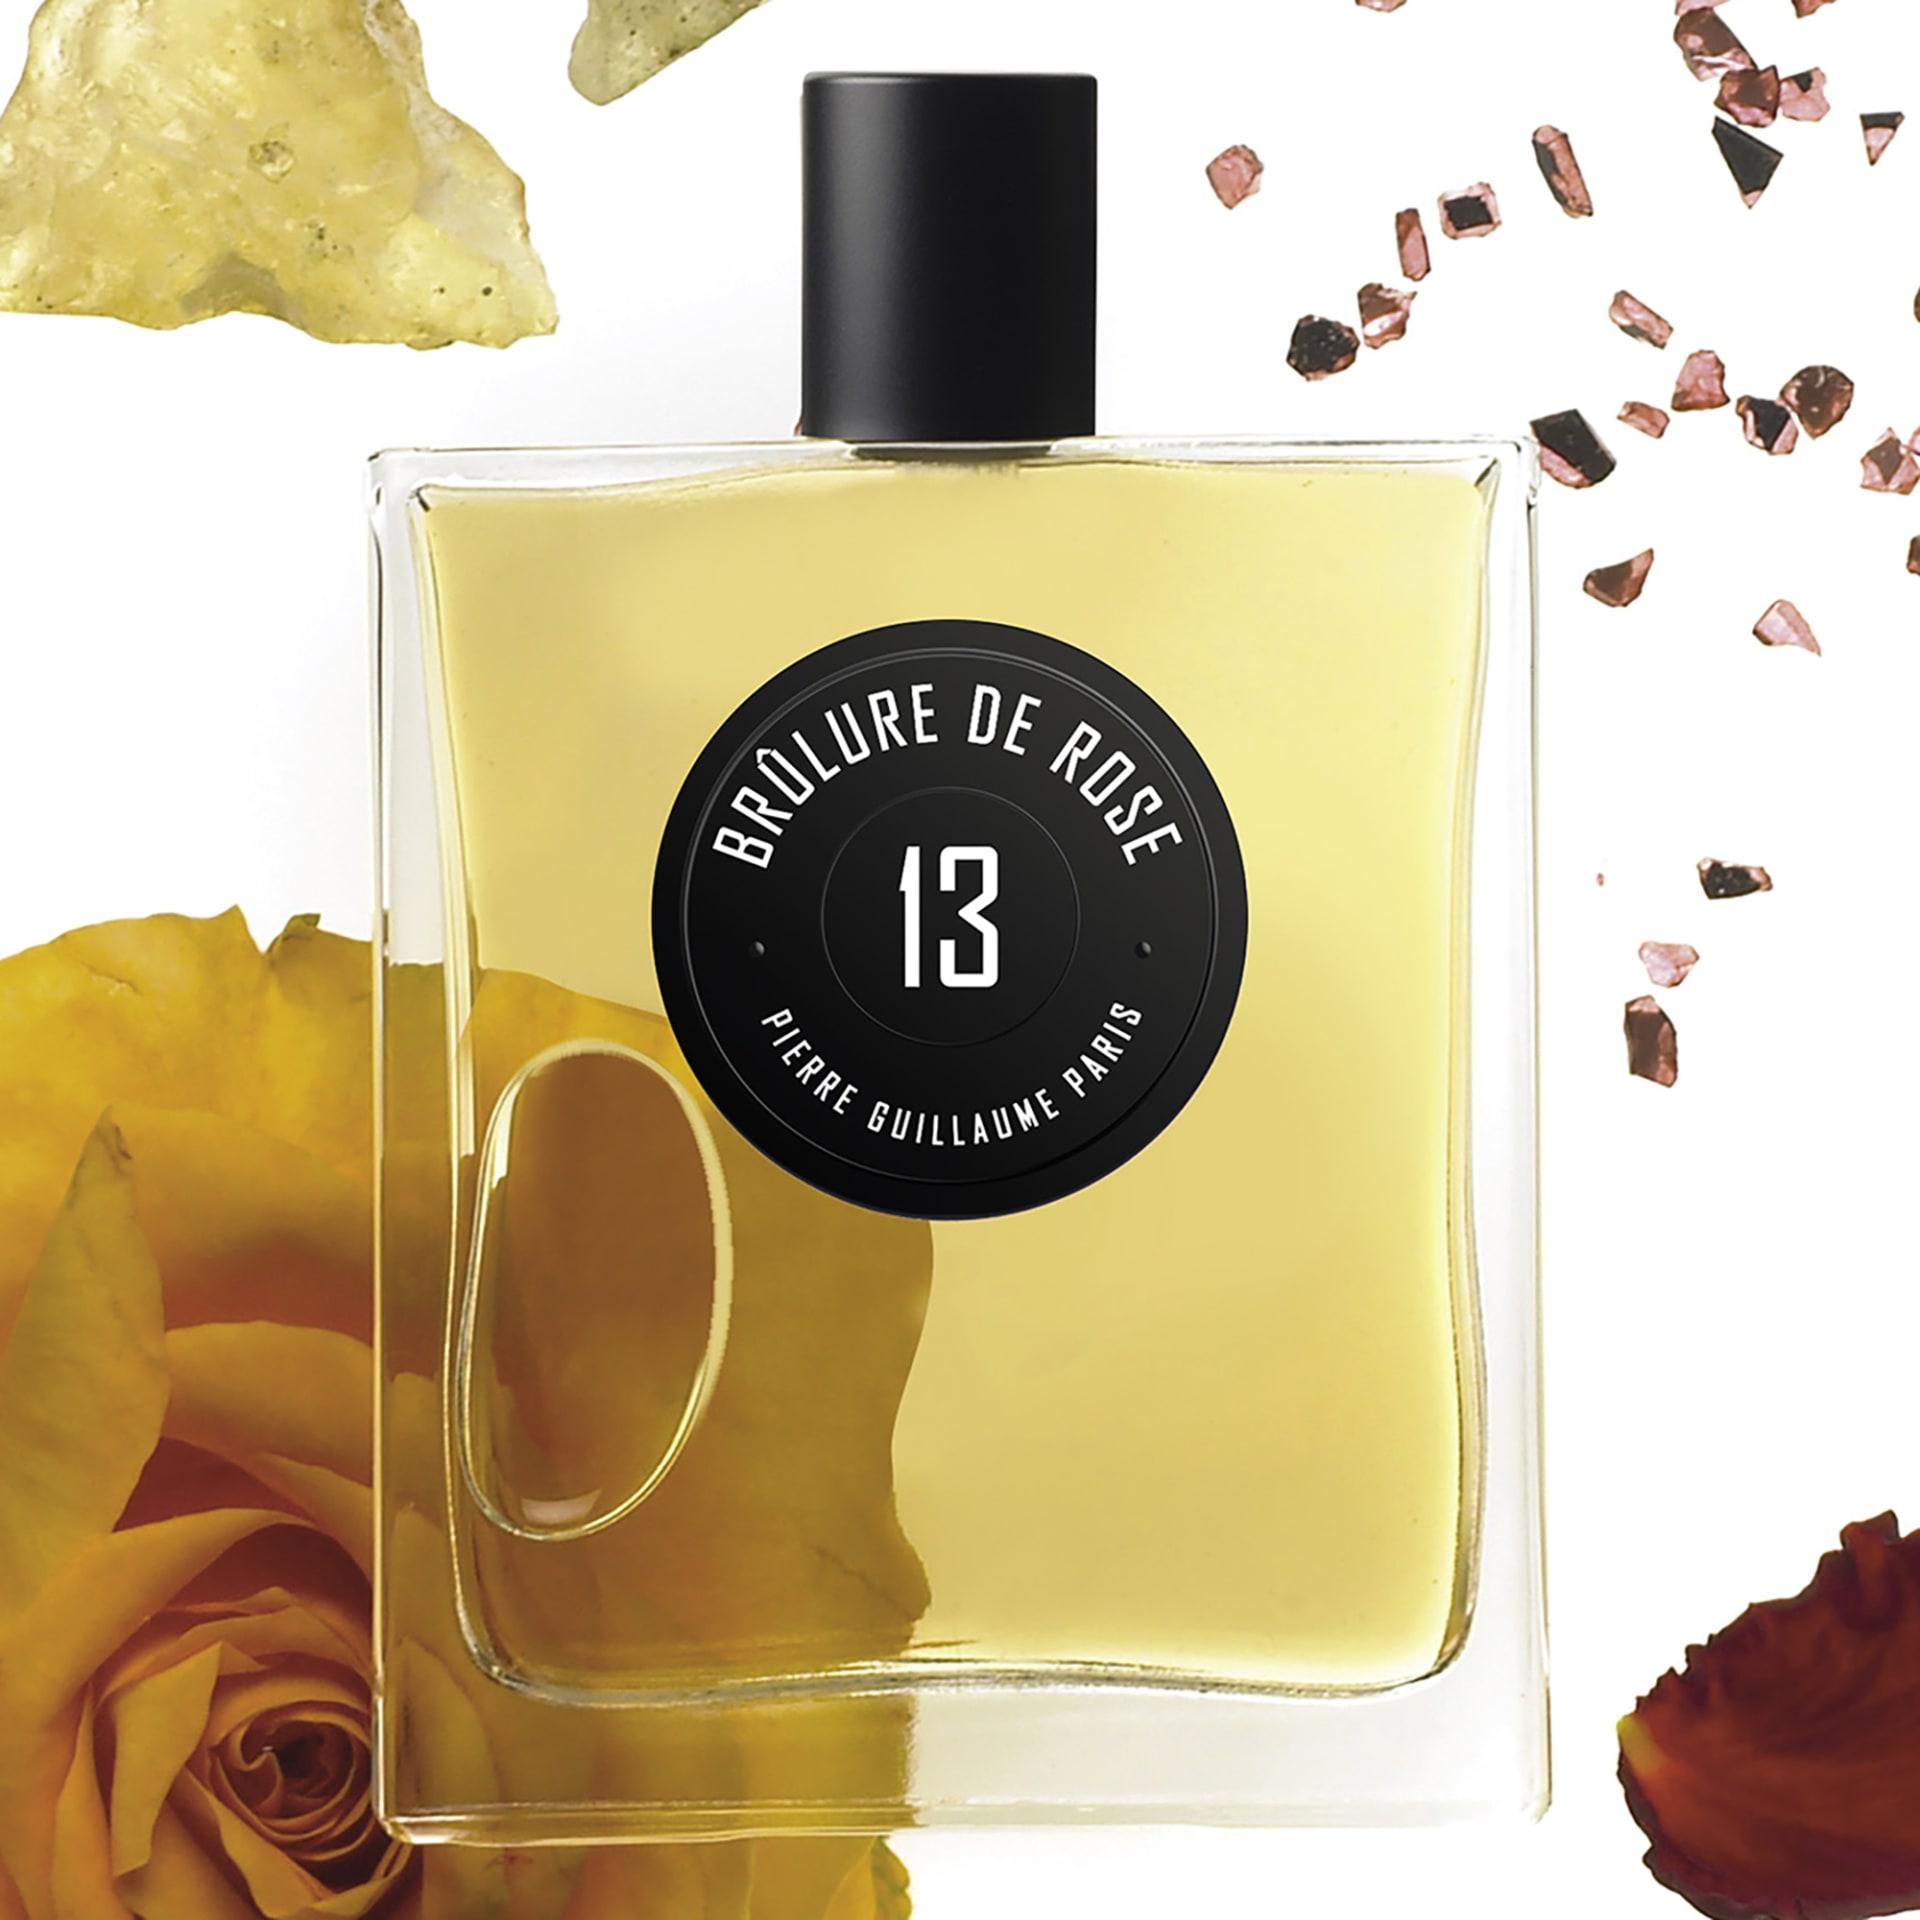 pierre-guillaume-13-brulure-de-rose-2